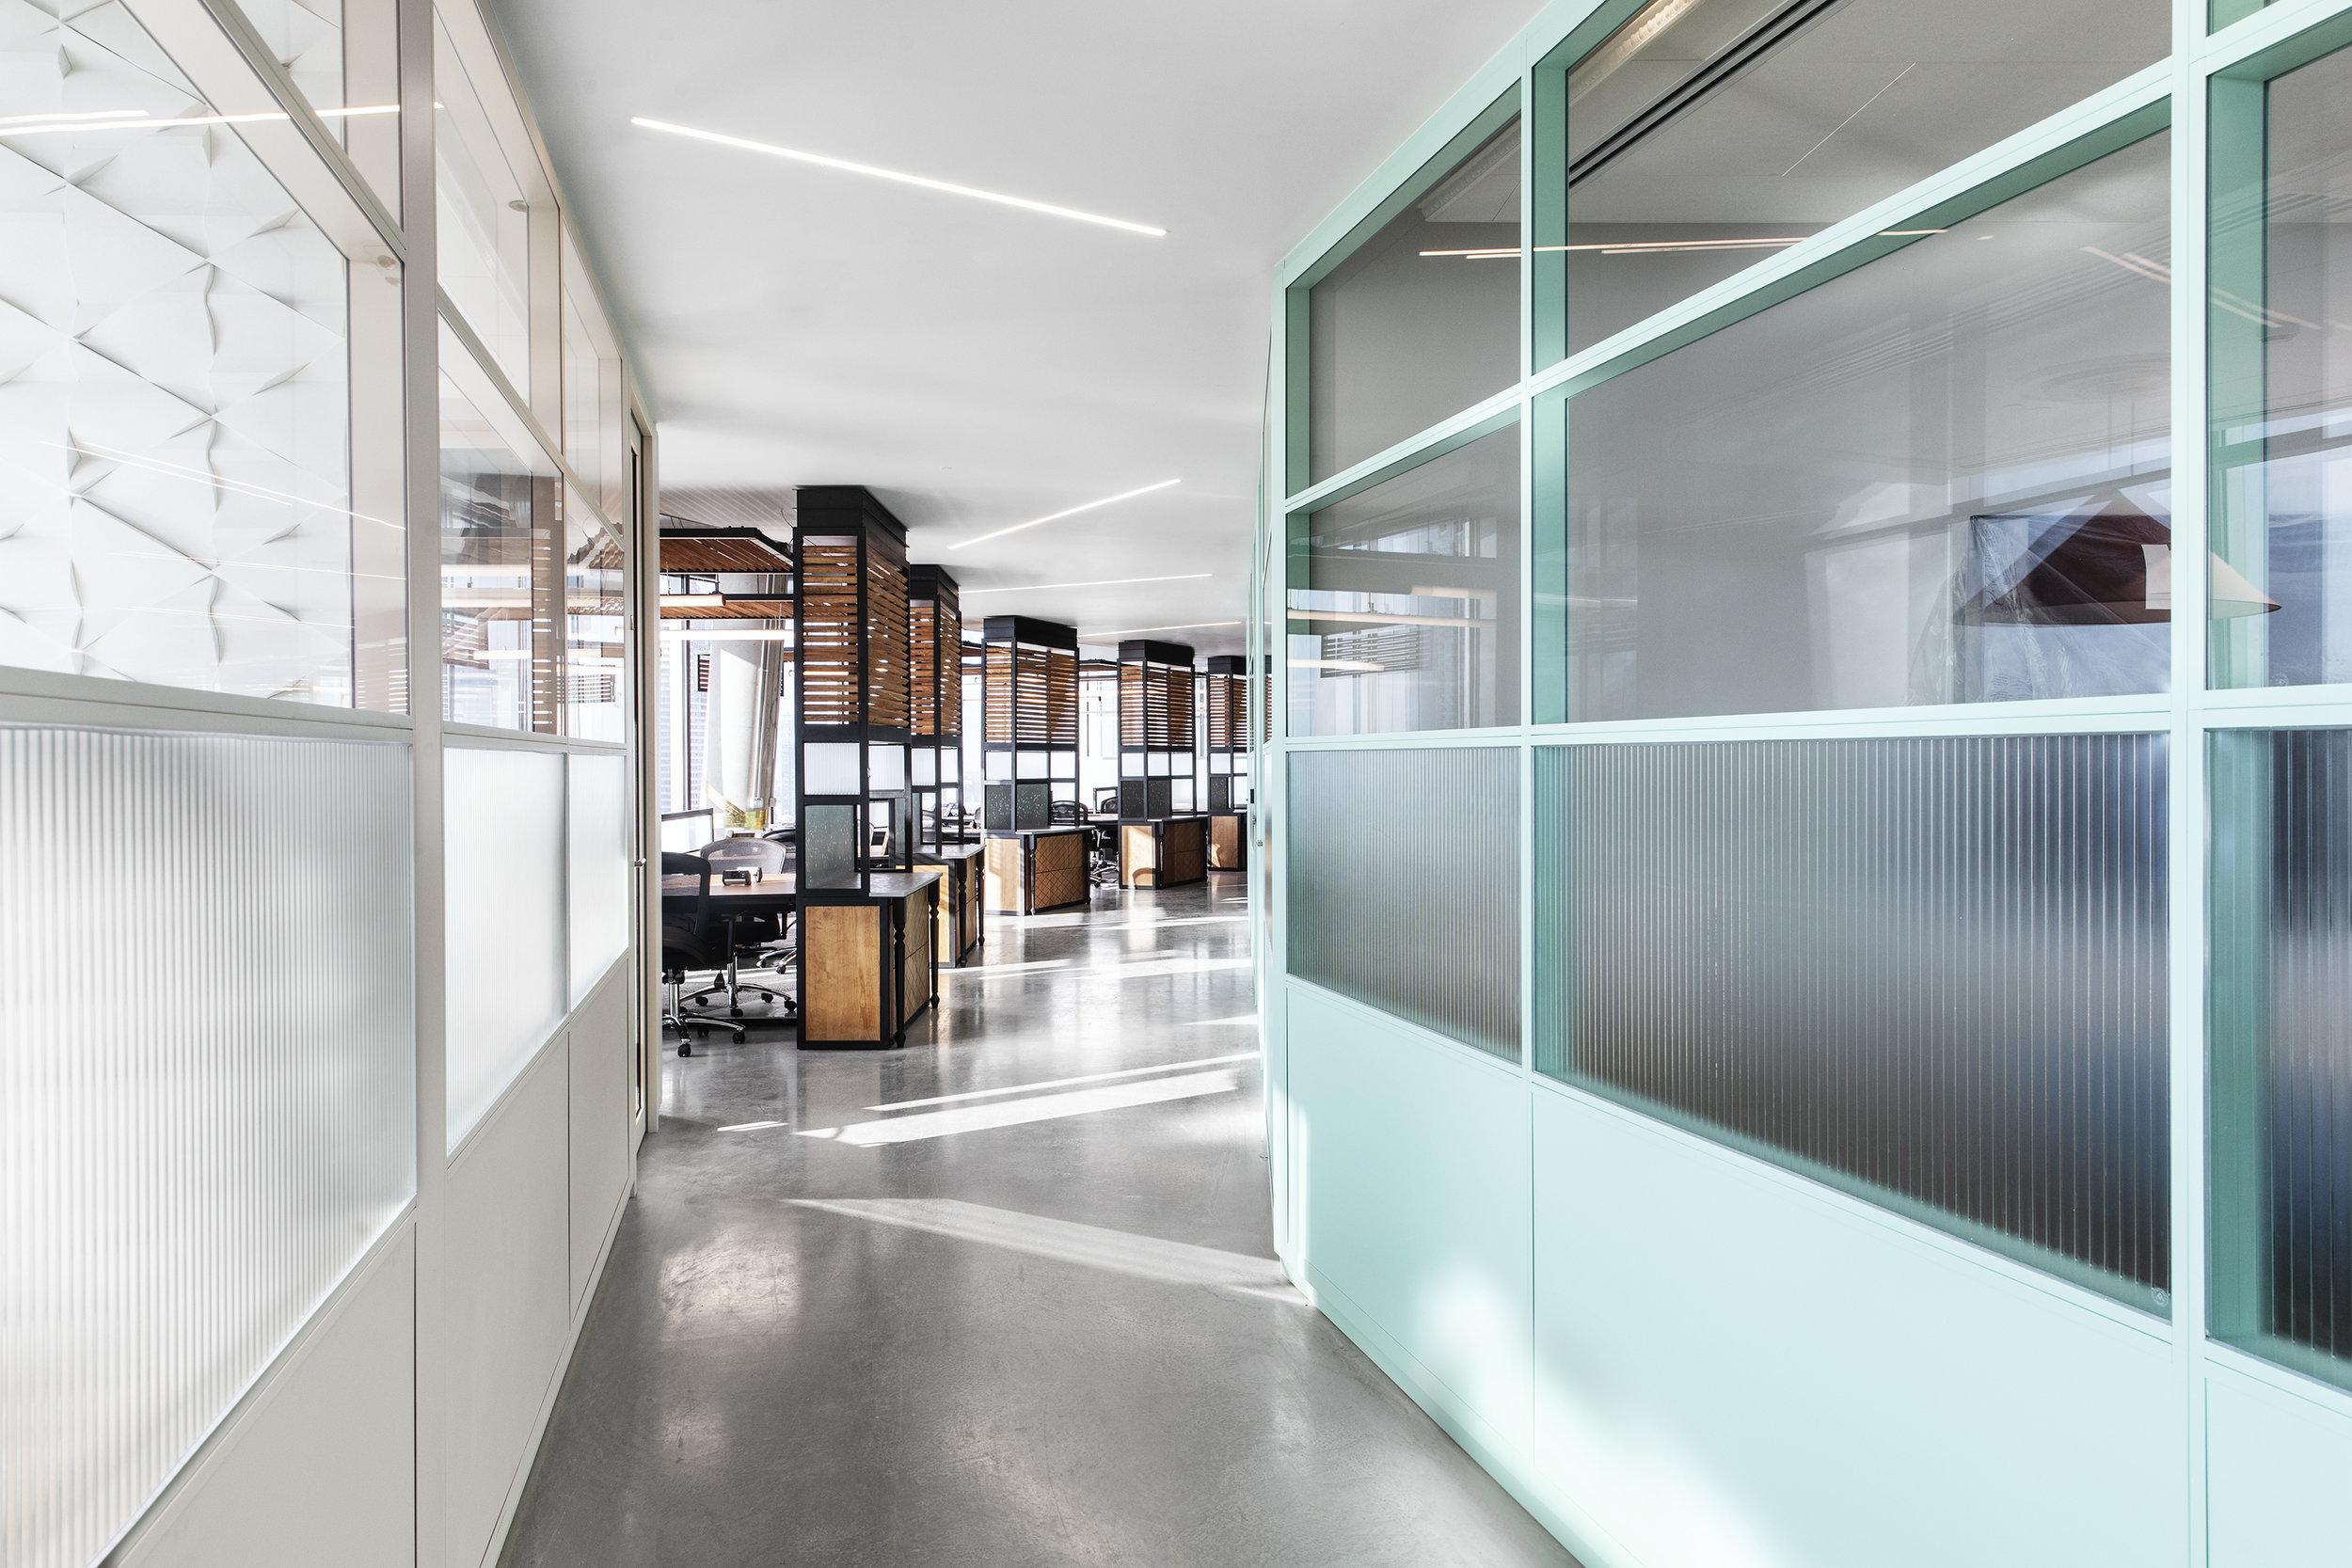 רואי דוד אדריכלות - אדריכל - נטורל אינטליג'נס - ROY DAVID - ARCHITECTURE - ARCHITECT - NI (104).jpg